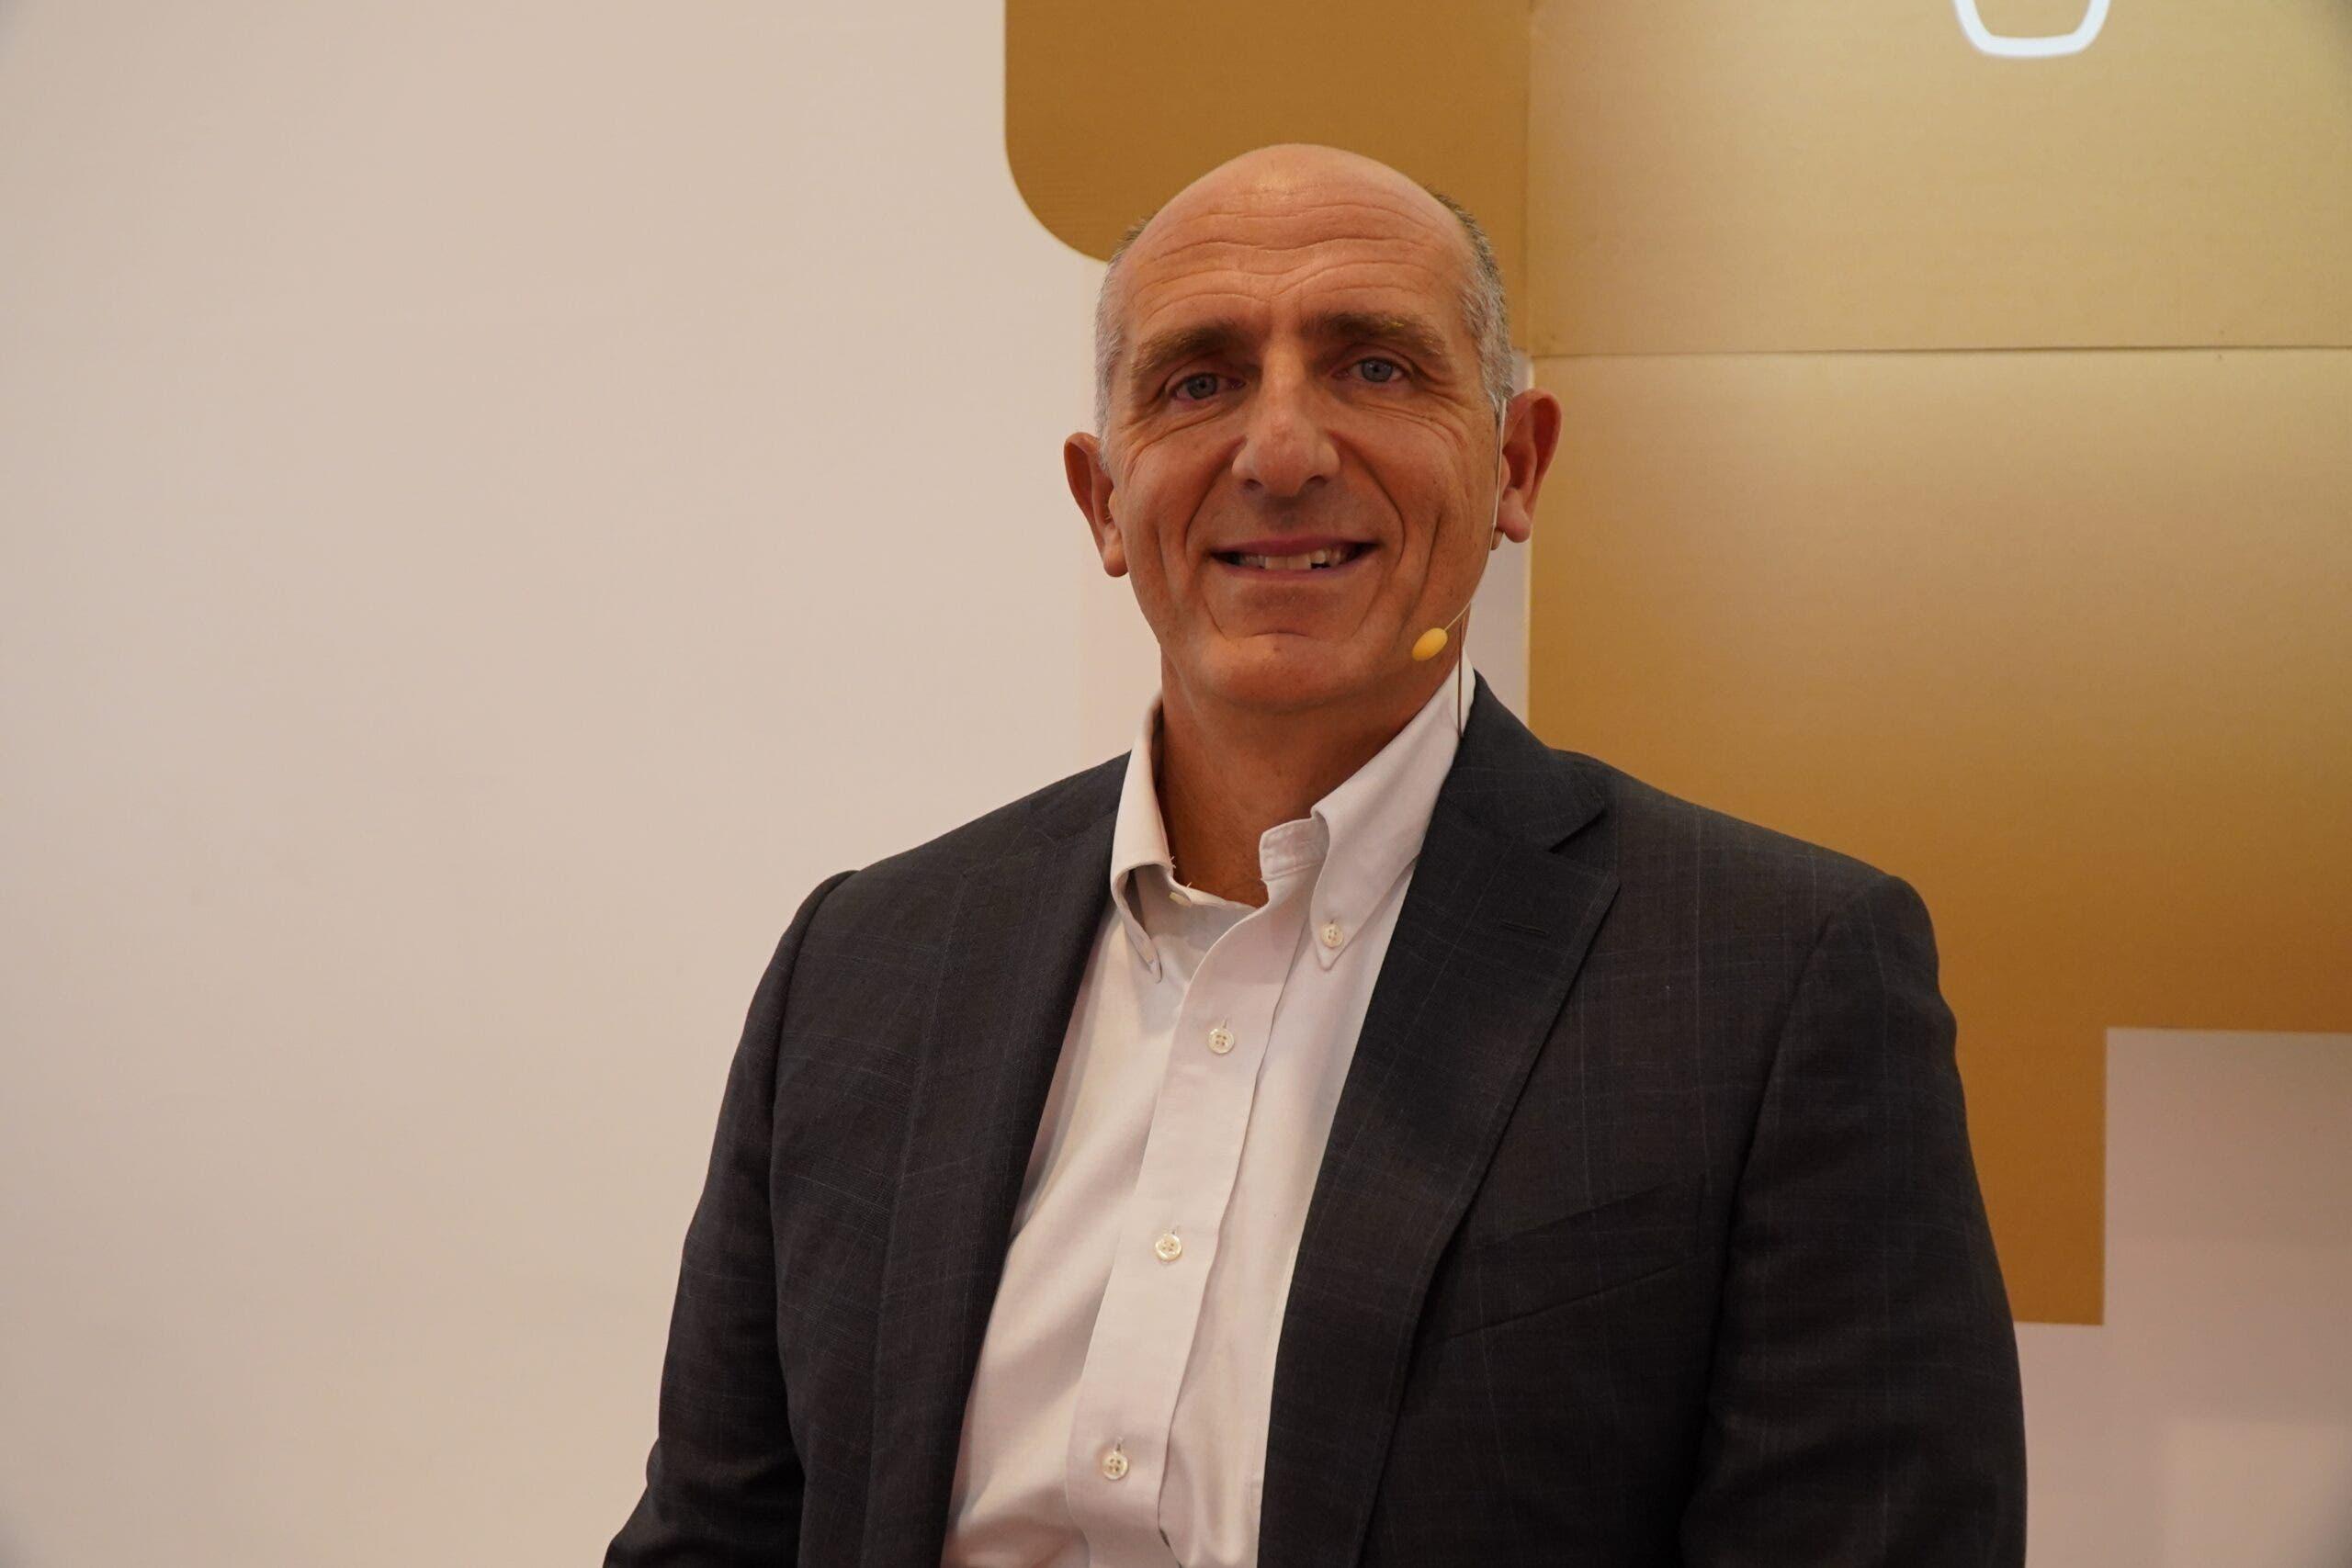 Gaetano Thorel PSA